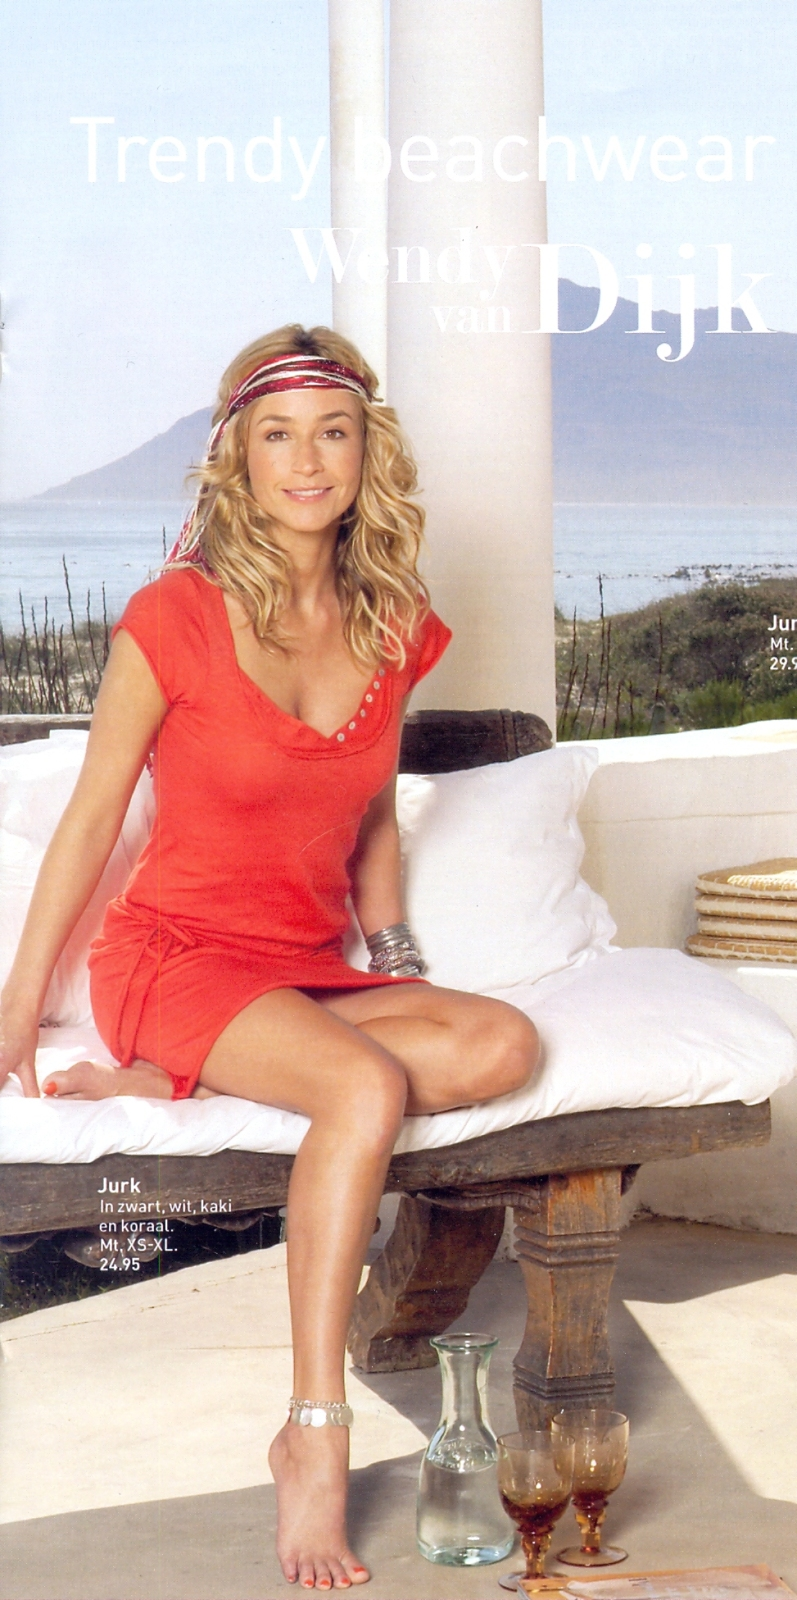 https://pics.wikifeet.com/Wendy-Van-Dijk-Feet-577902.jpg